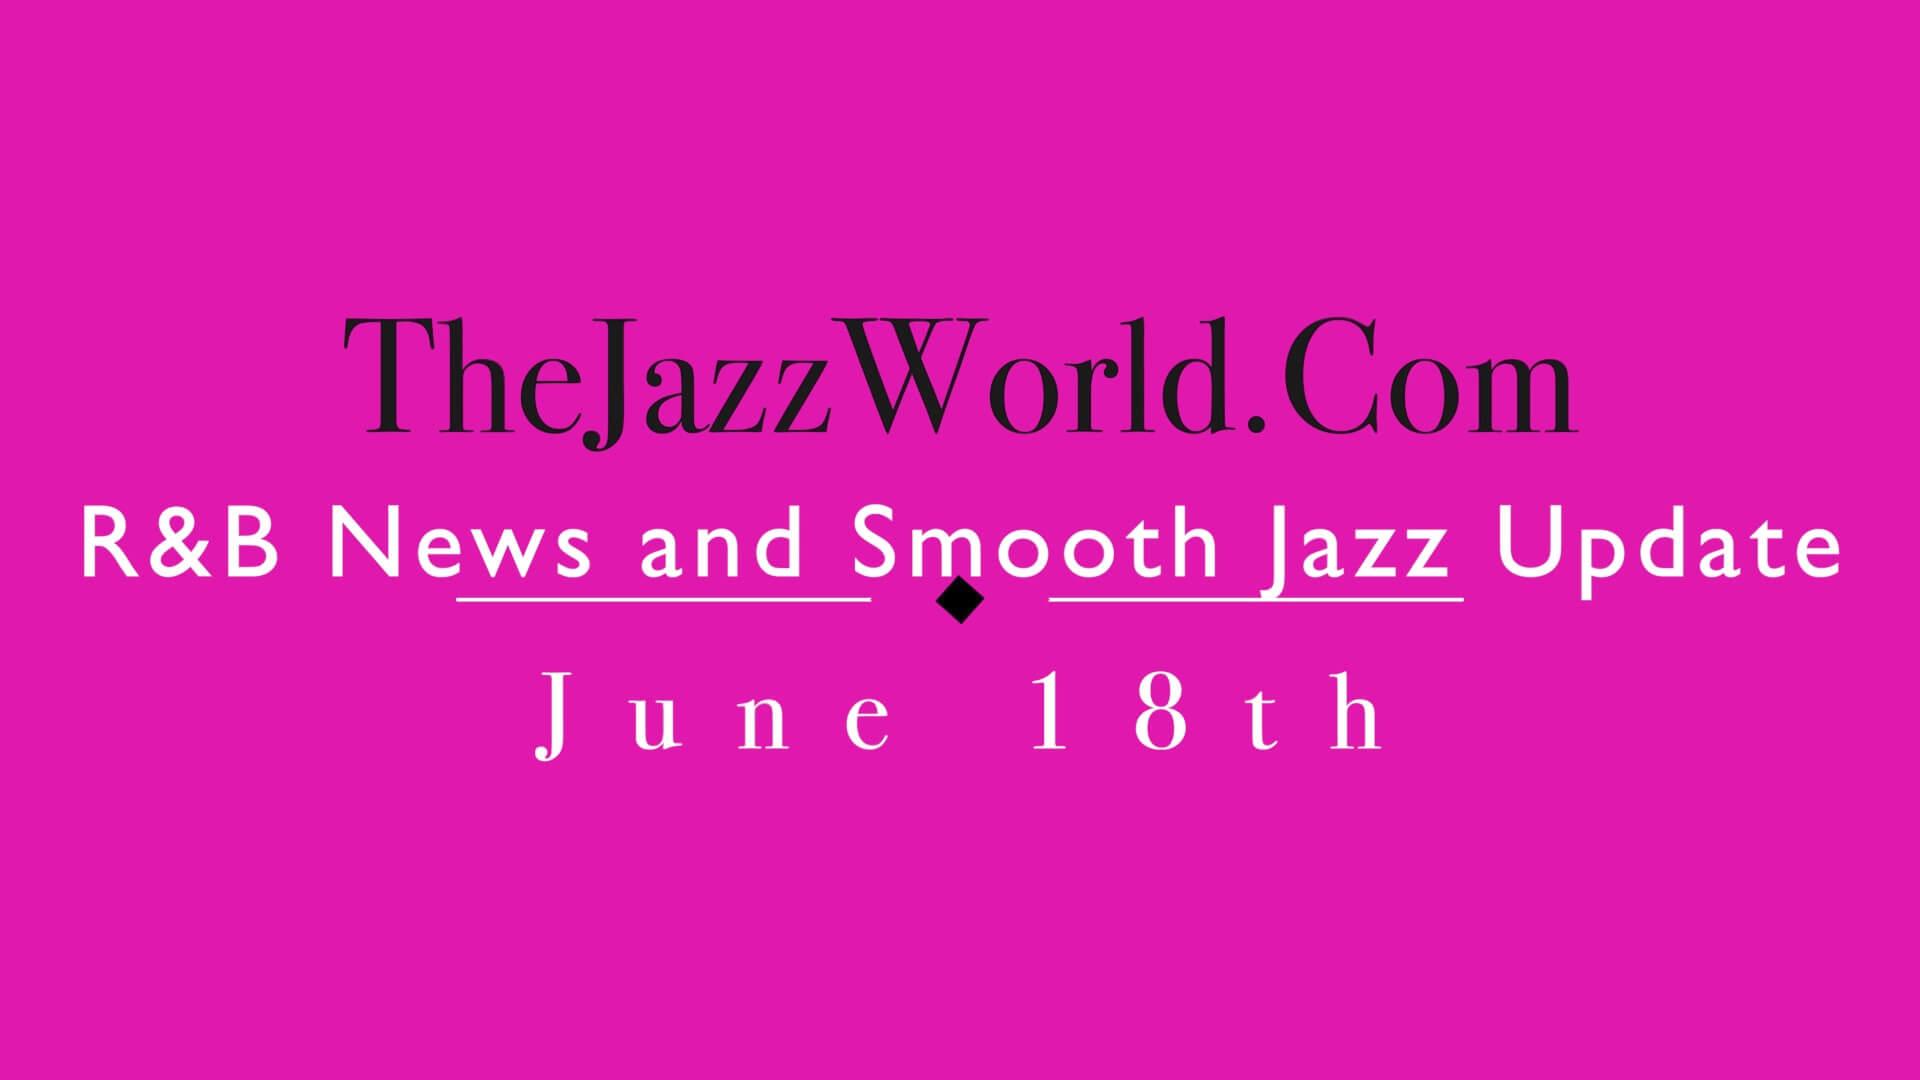 The Jazz World Show 6:18